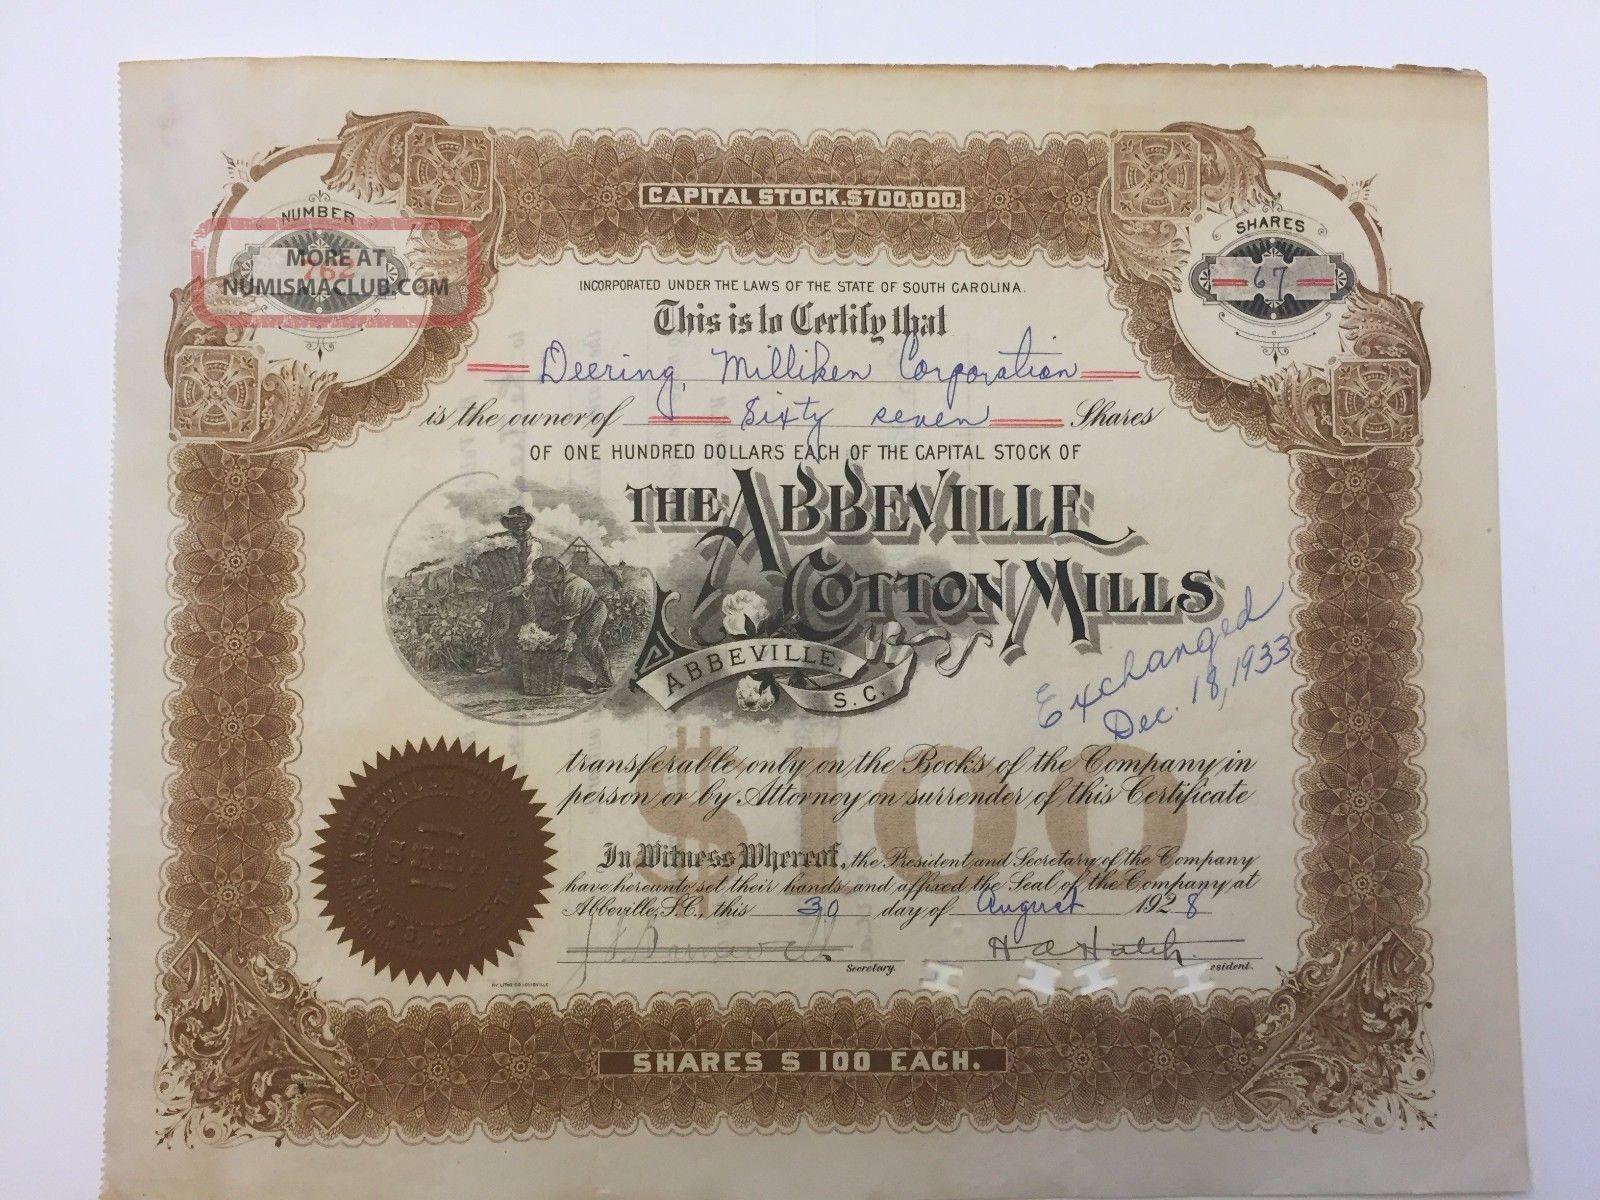 1928 Abbeville Cotton Mills Stock Certificate Rare South Carolina Slave Vignette Stocks & Bonds, Scripophily photo